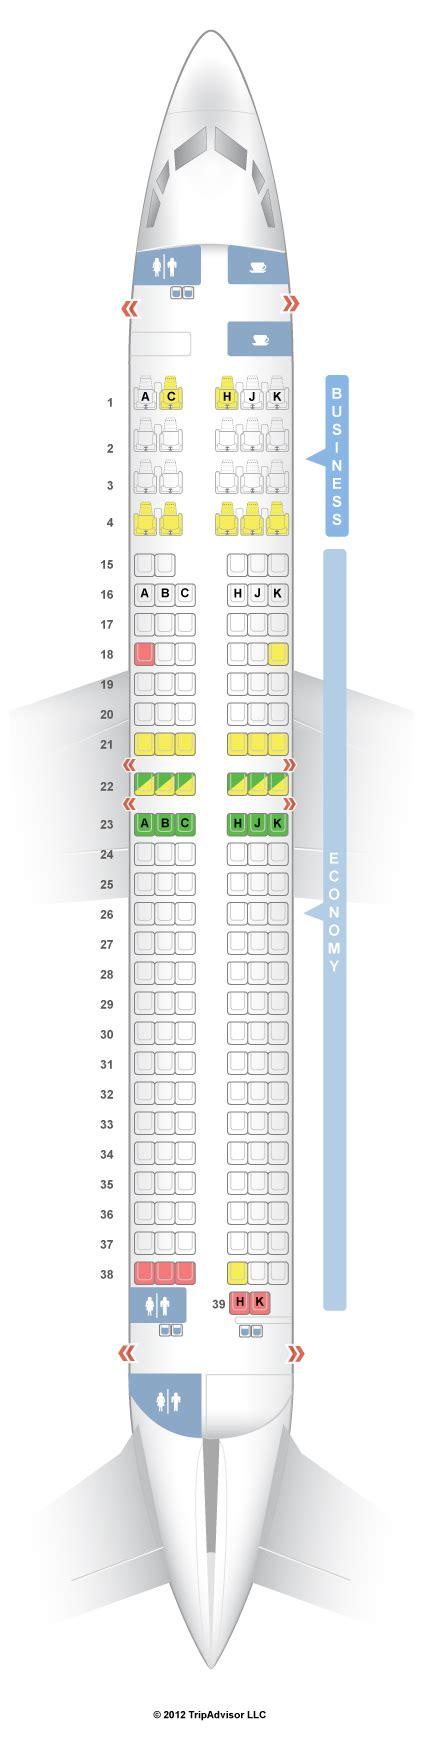 transavia seats seatguru seat map japan airlines boeing 737 800 738 domestic